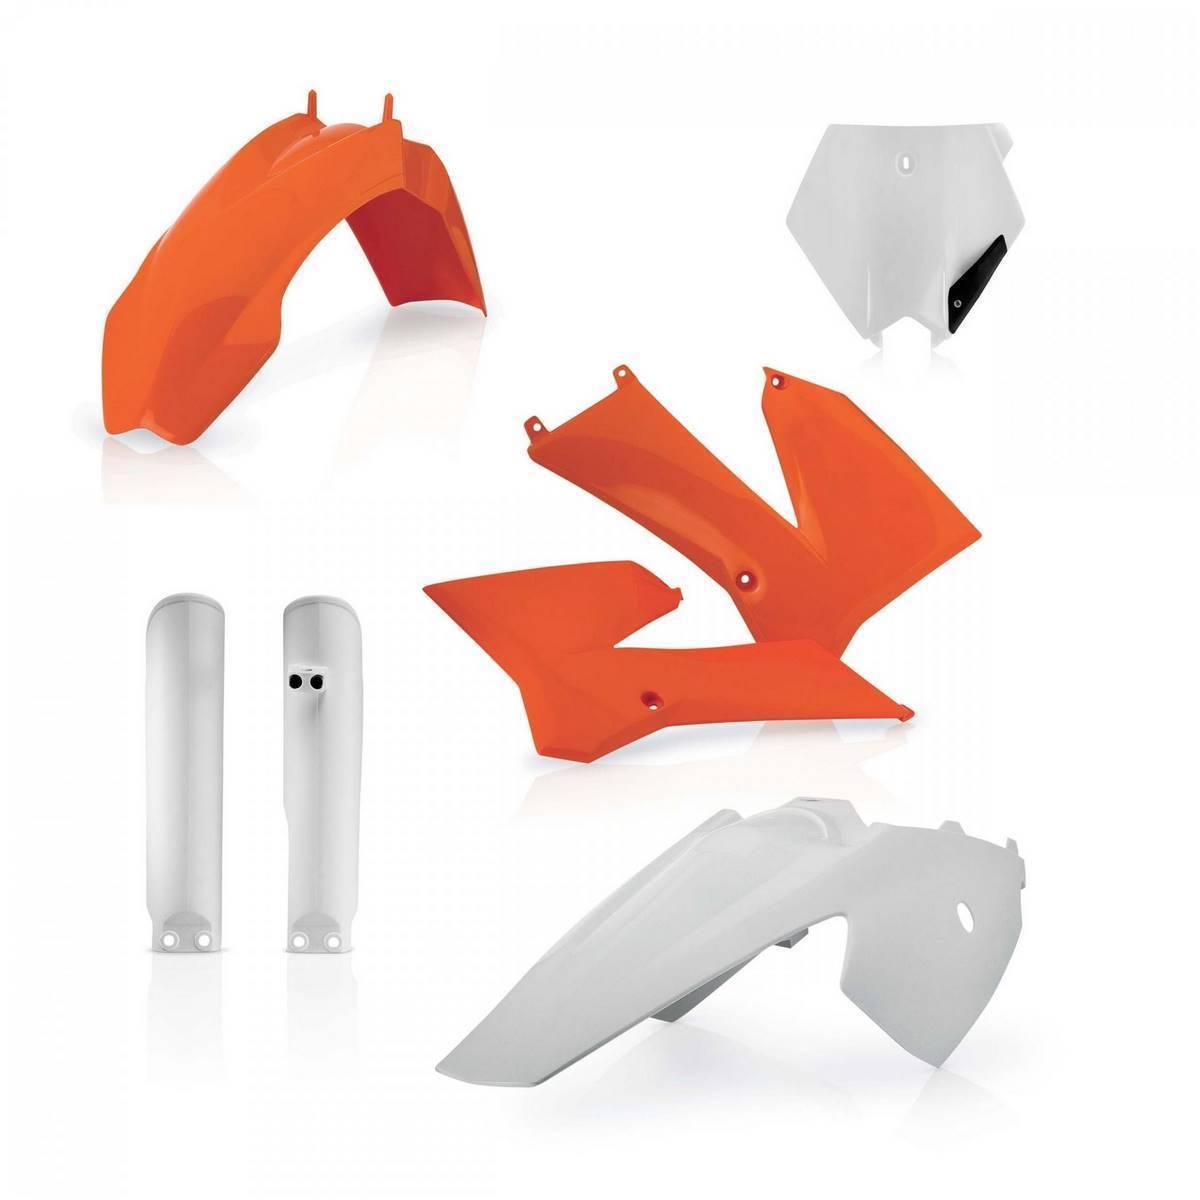 0016374-553 - Full Kit Plasticos Sx 85 06 12 Origen